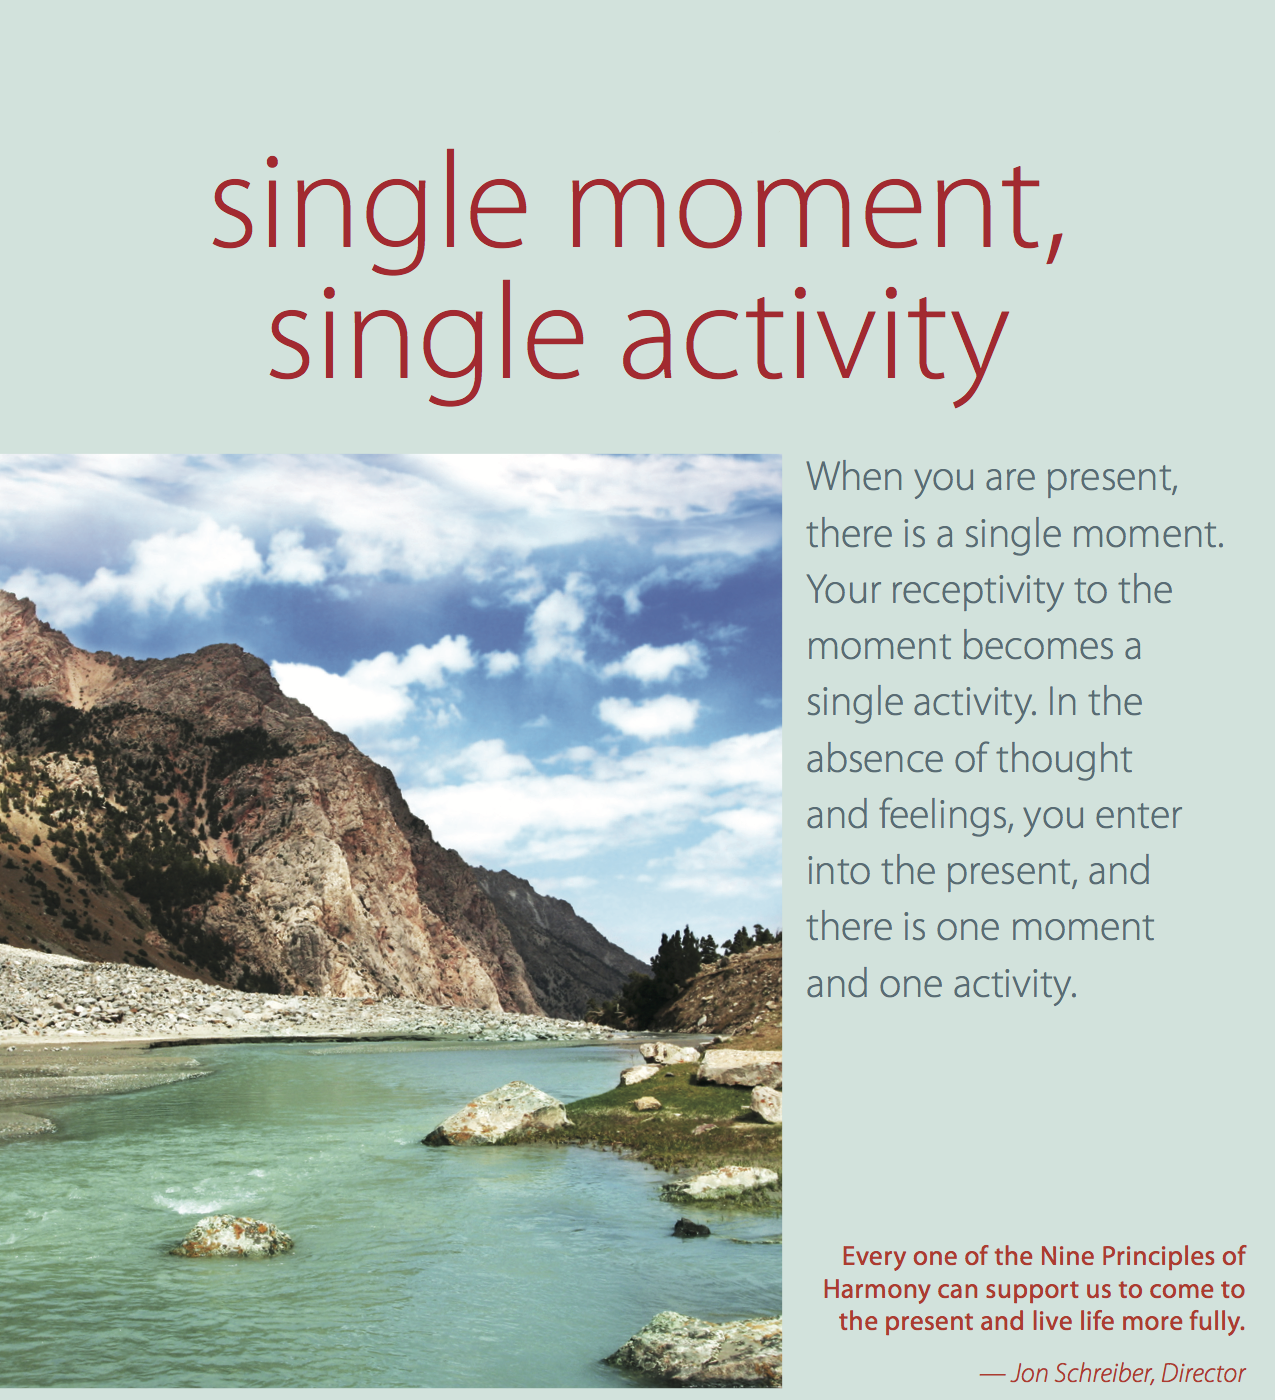 SingleMomentSingleActivityPoster.png